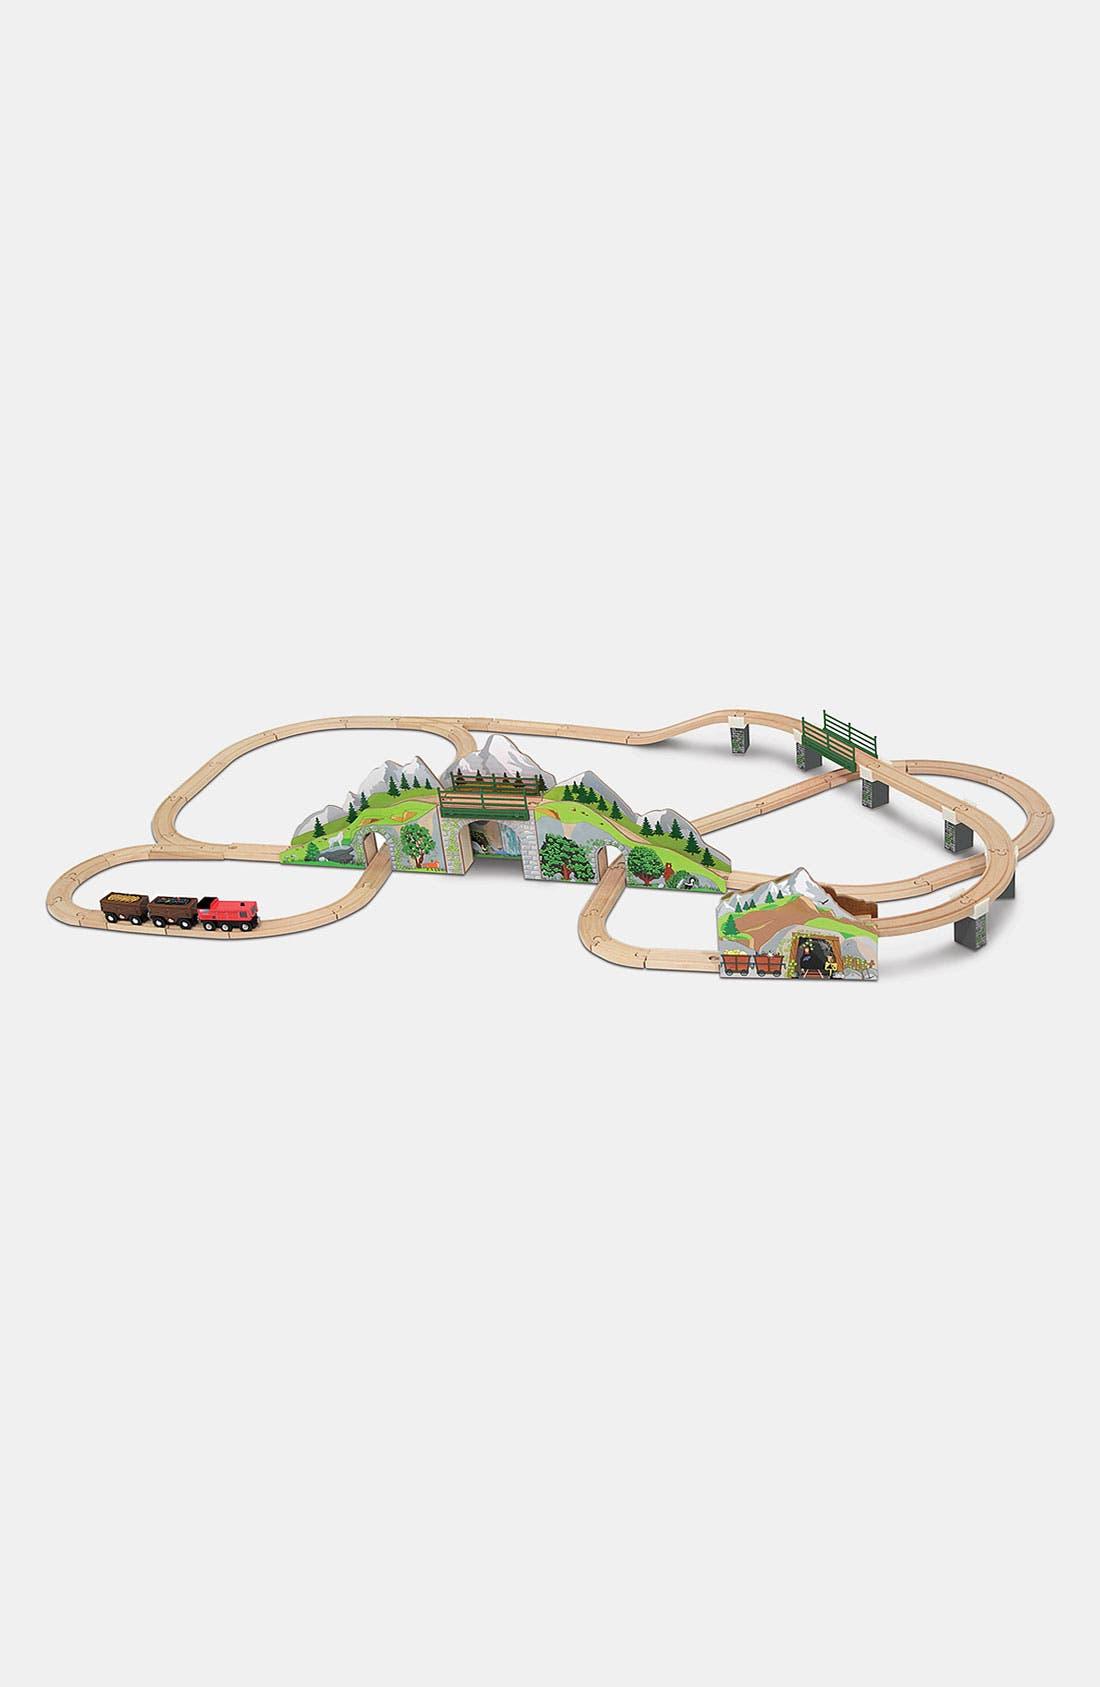 Toddler Melissa  Doug Mountain Tunnel Wooden Train Toy